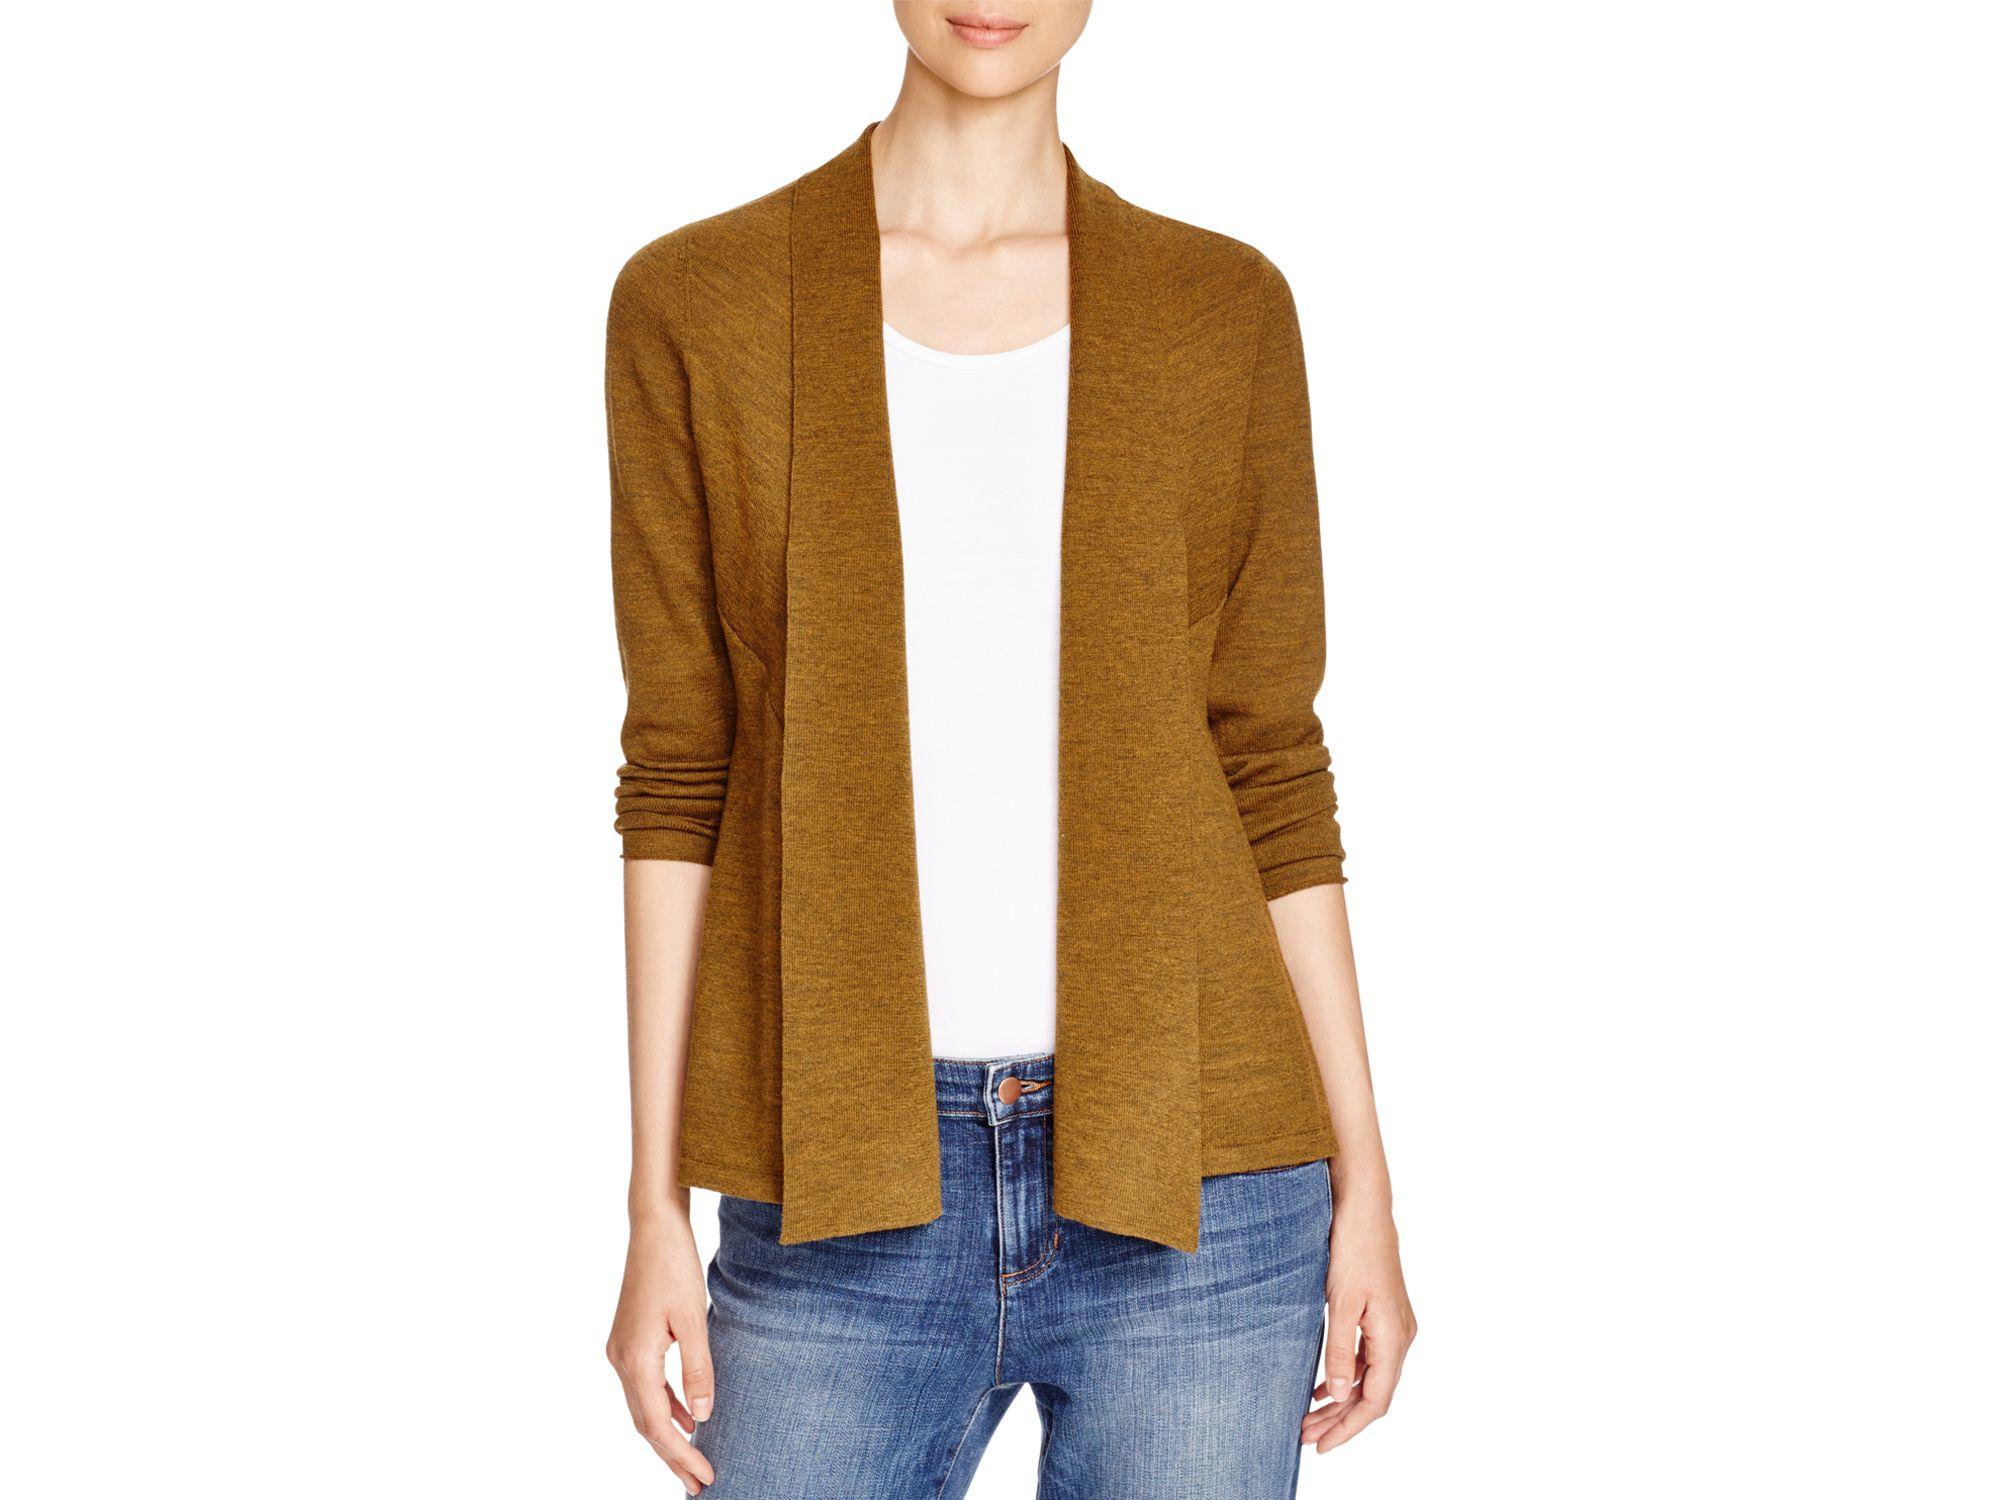 Eileen fisher Wool Shawl Collar Cardigan in Brown | Lyst